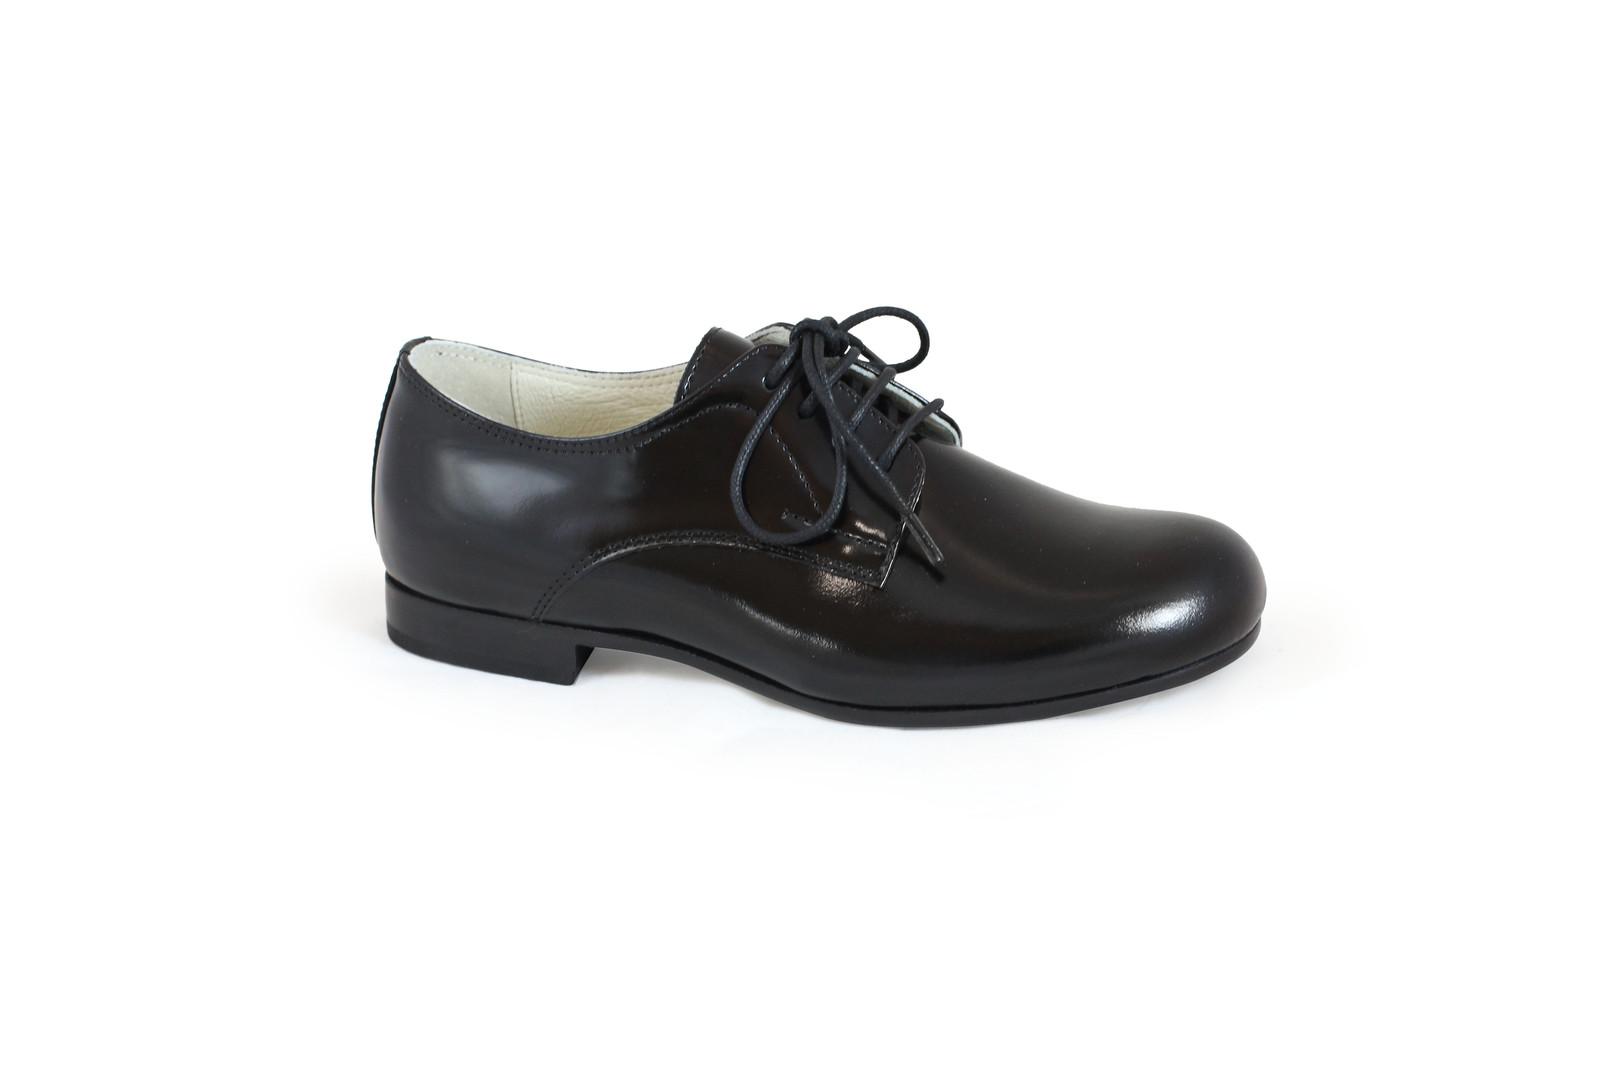 London Kids Shoes